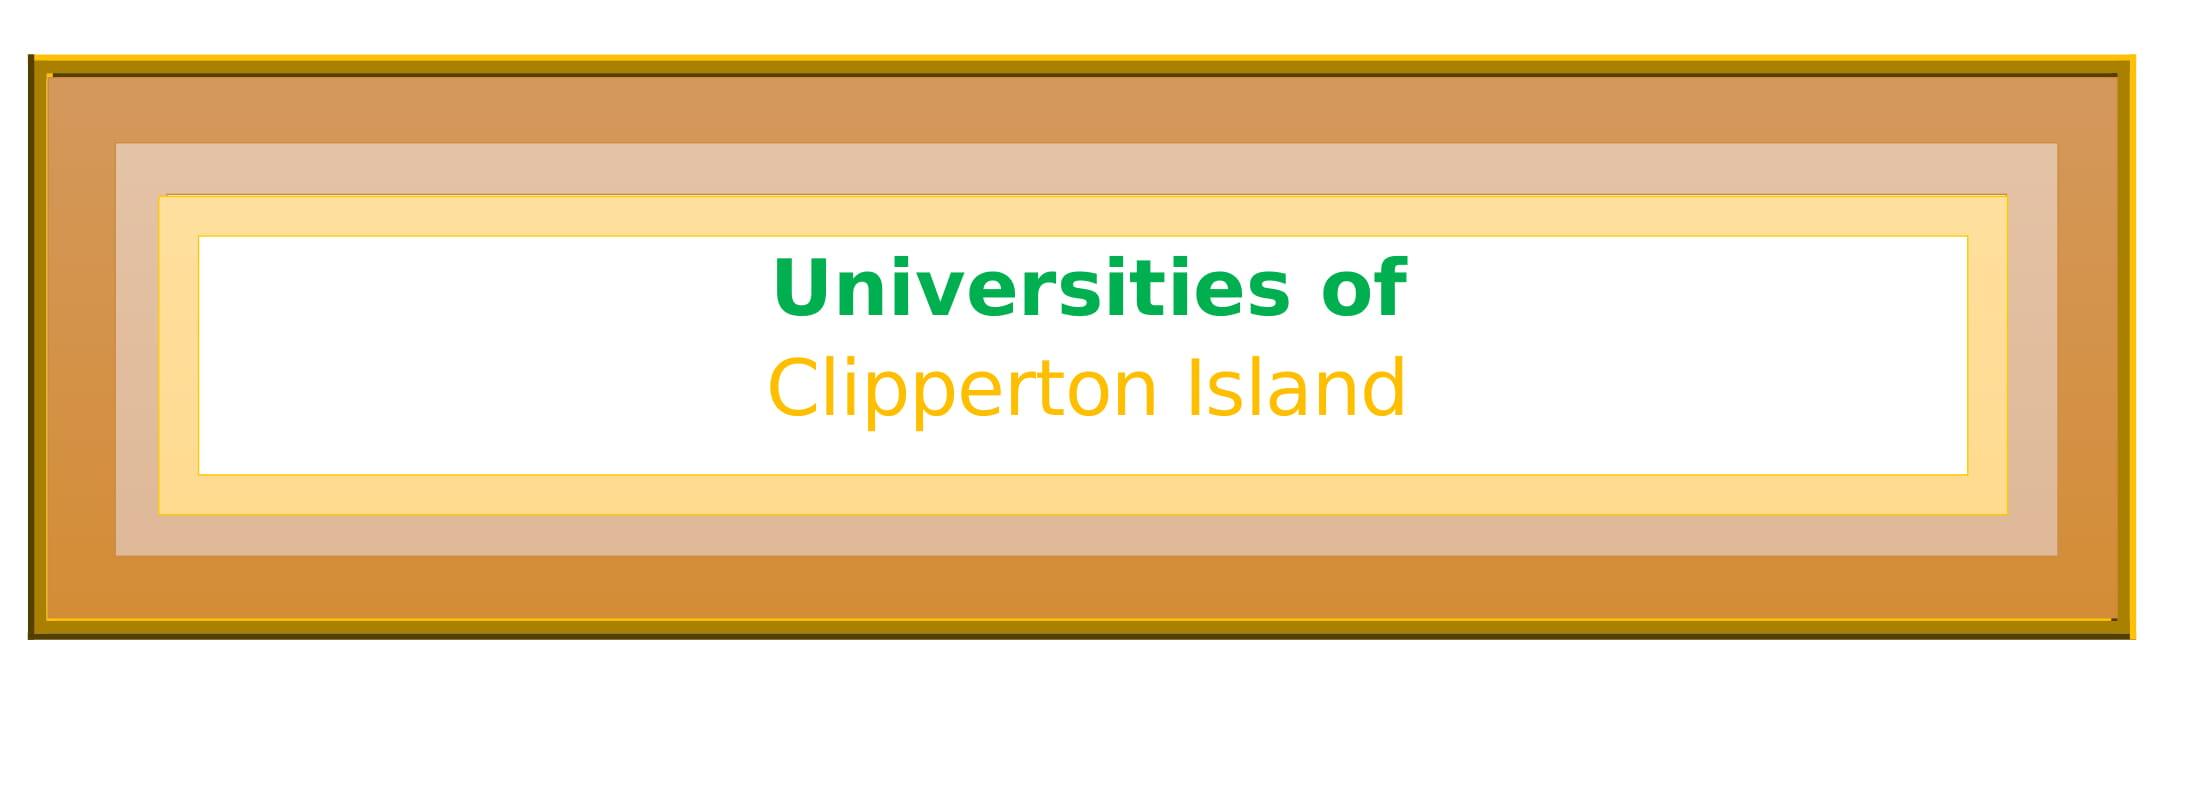 List of Universities in Clipperton Island